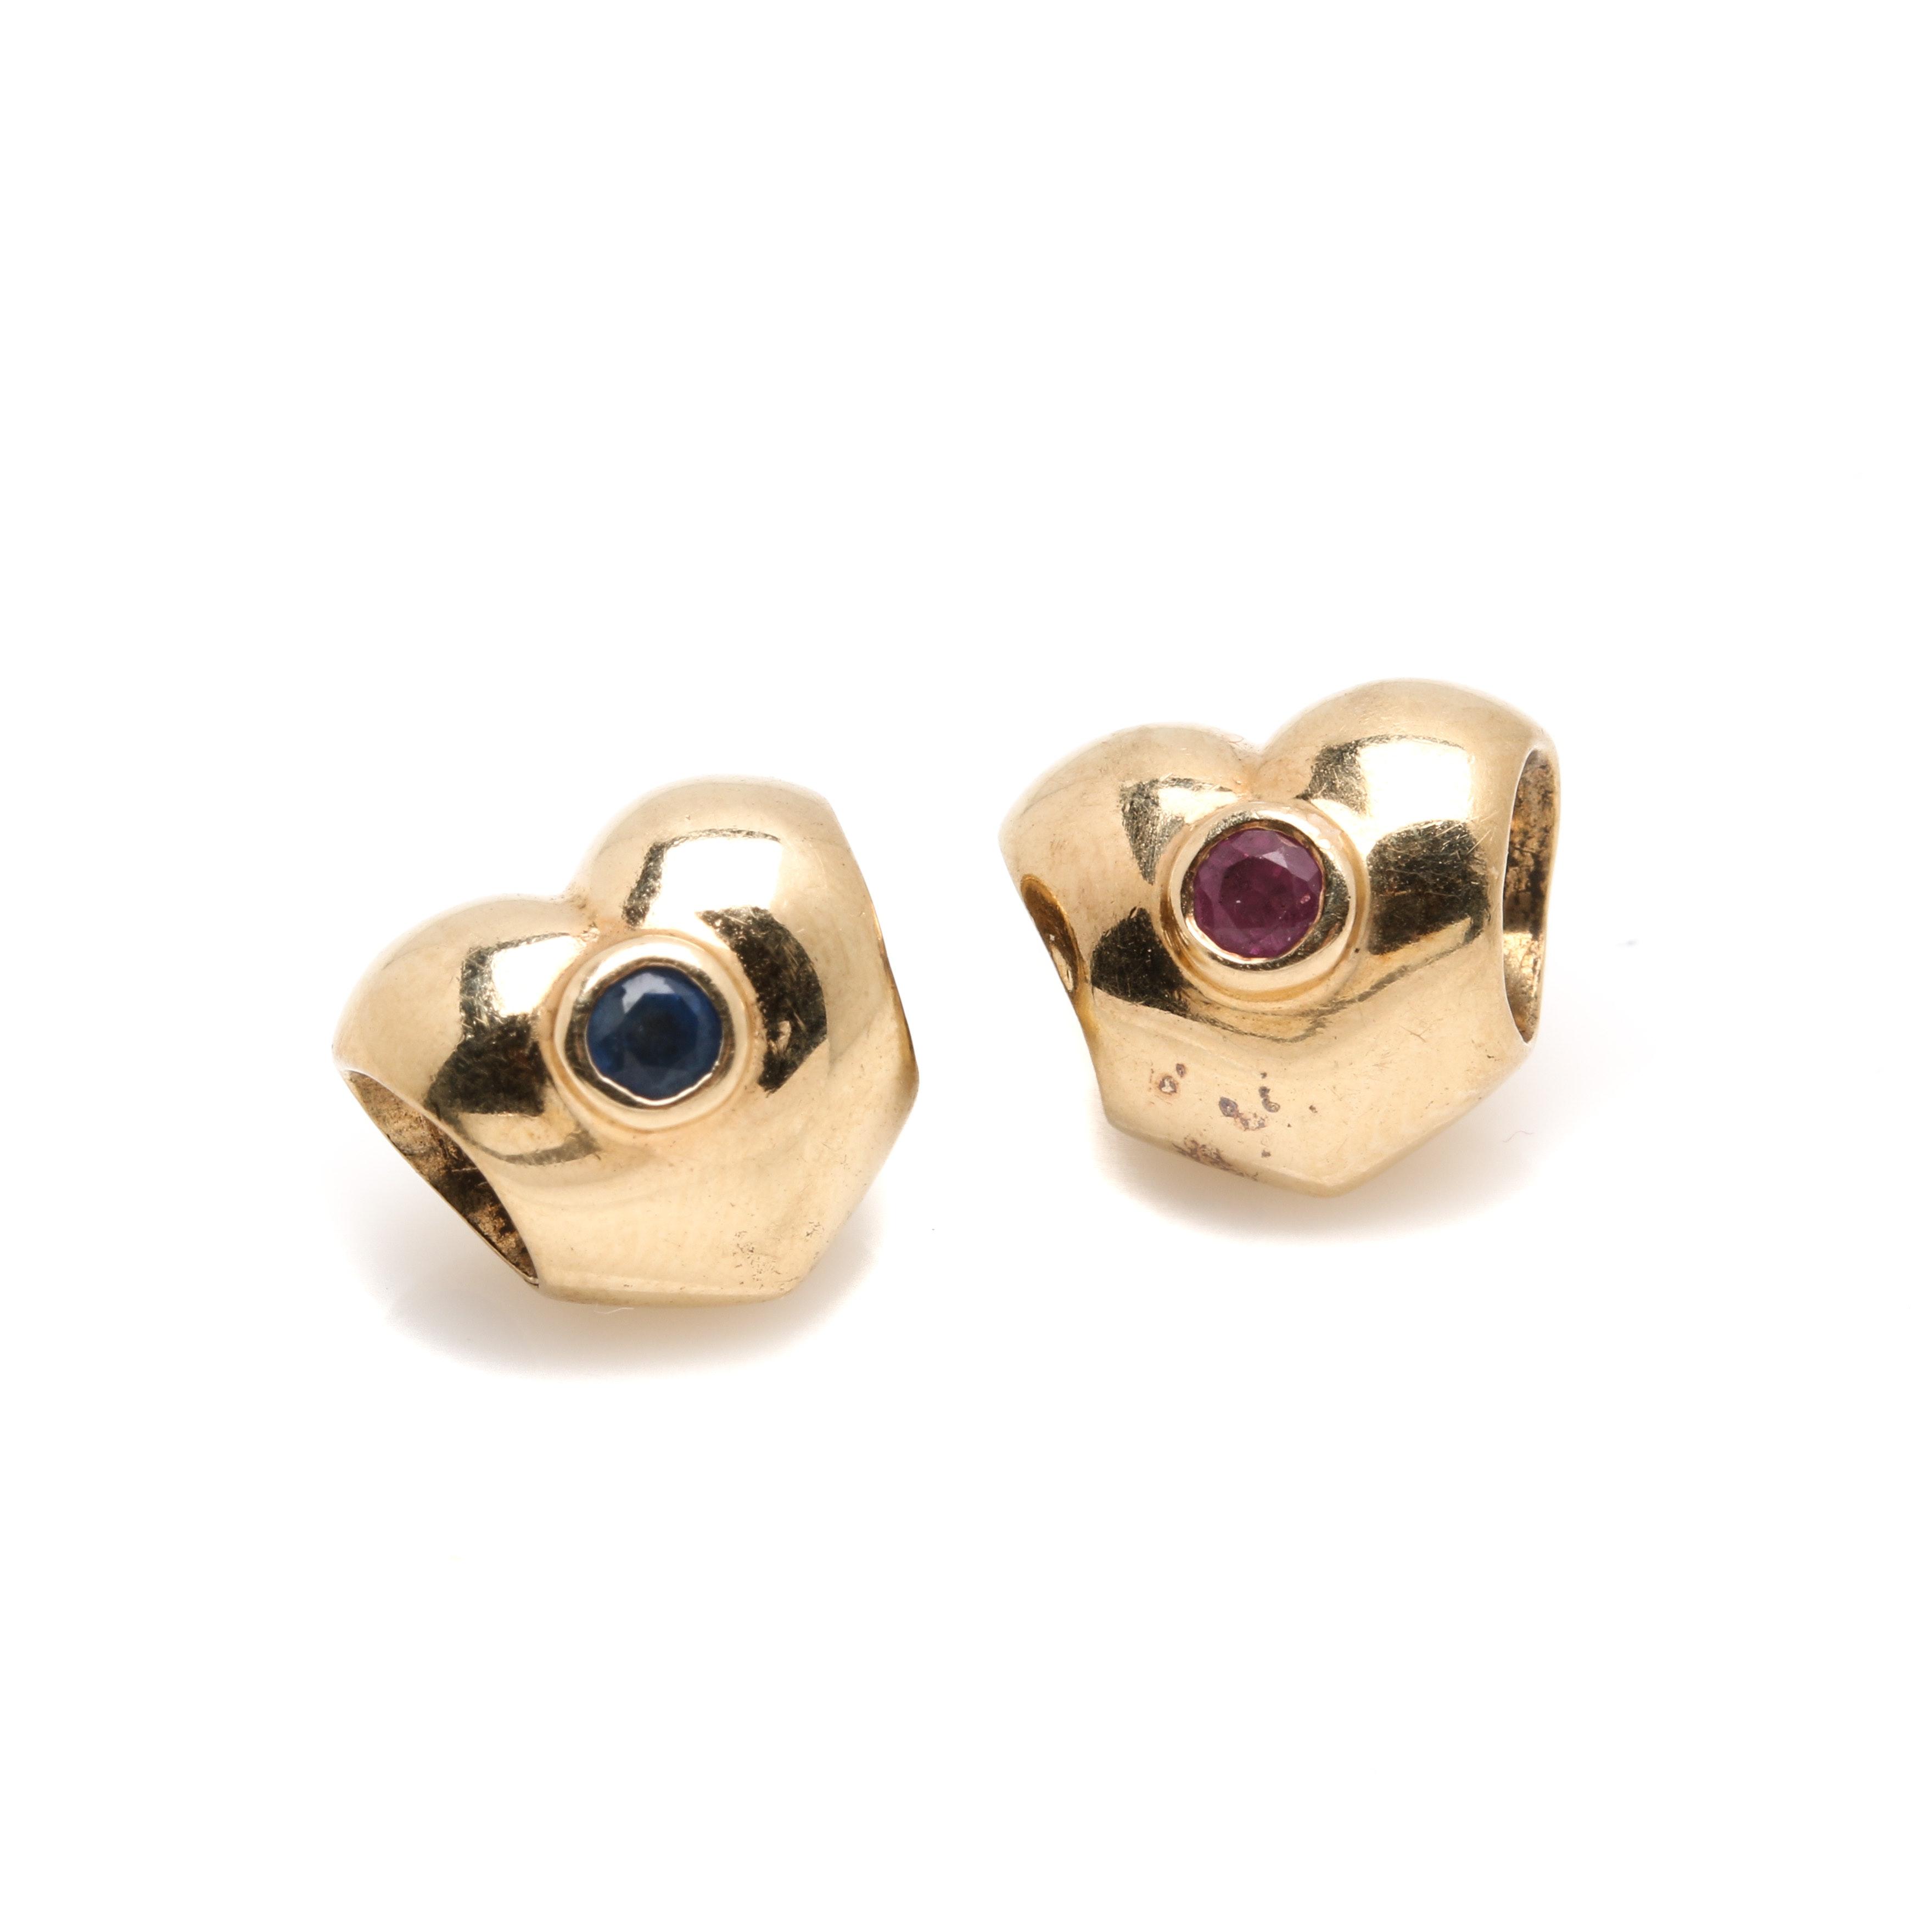 Pandora 14K Yellow Gold Ruby and Sapphire Beads